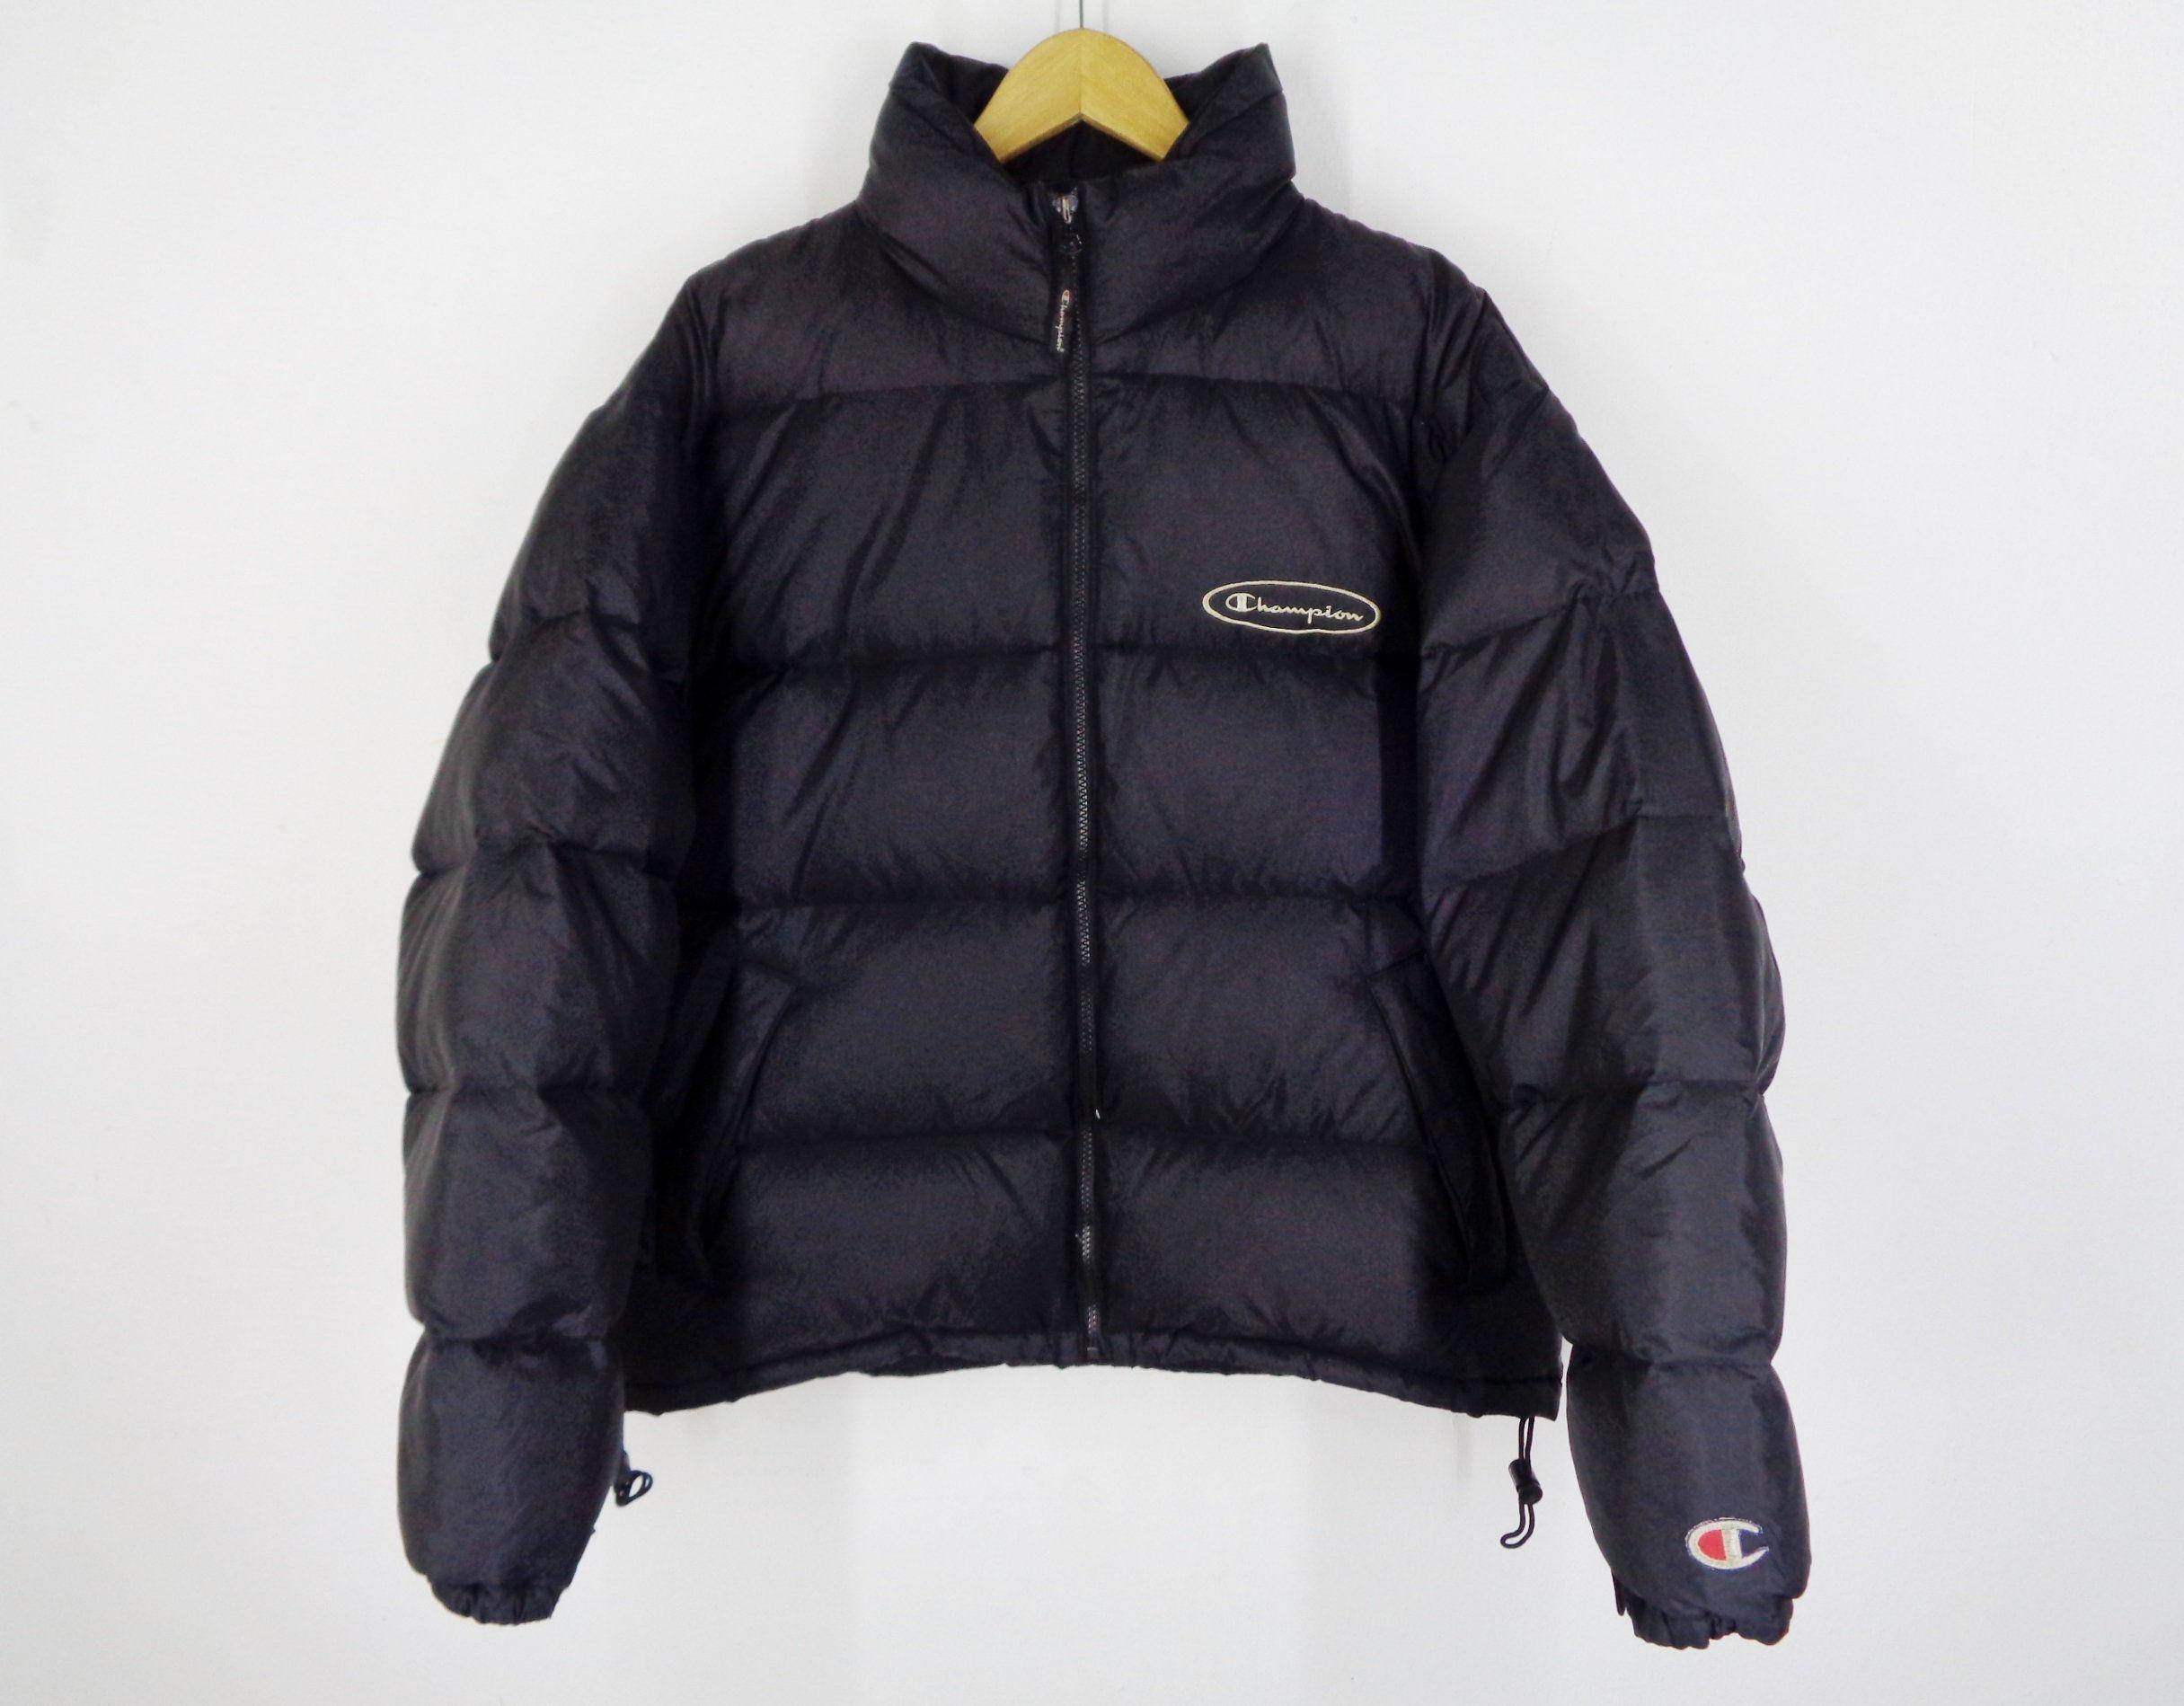 Champion Jacket Vintage Champion Puffer Jacket Vintage 90 S Champion Winter Zipper Puffer Goose Down Jacket Size M Champion Jacket Jackets Vintage Champion [ 1899 x 2431 Pixel ]